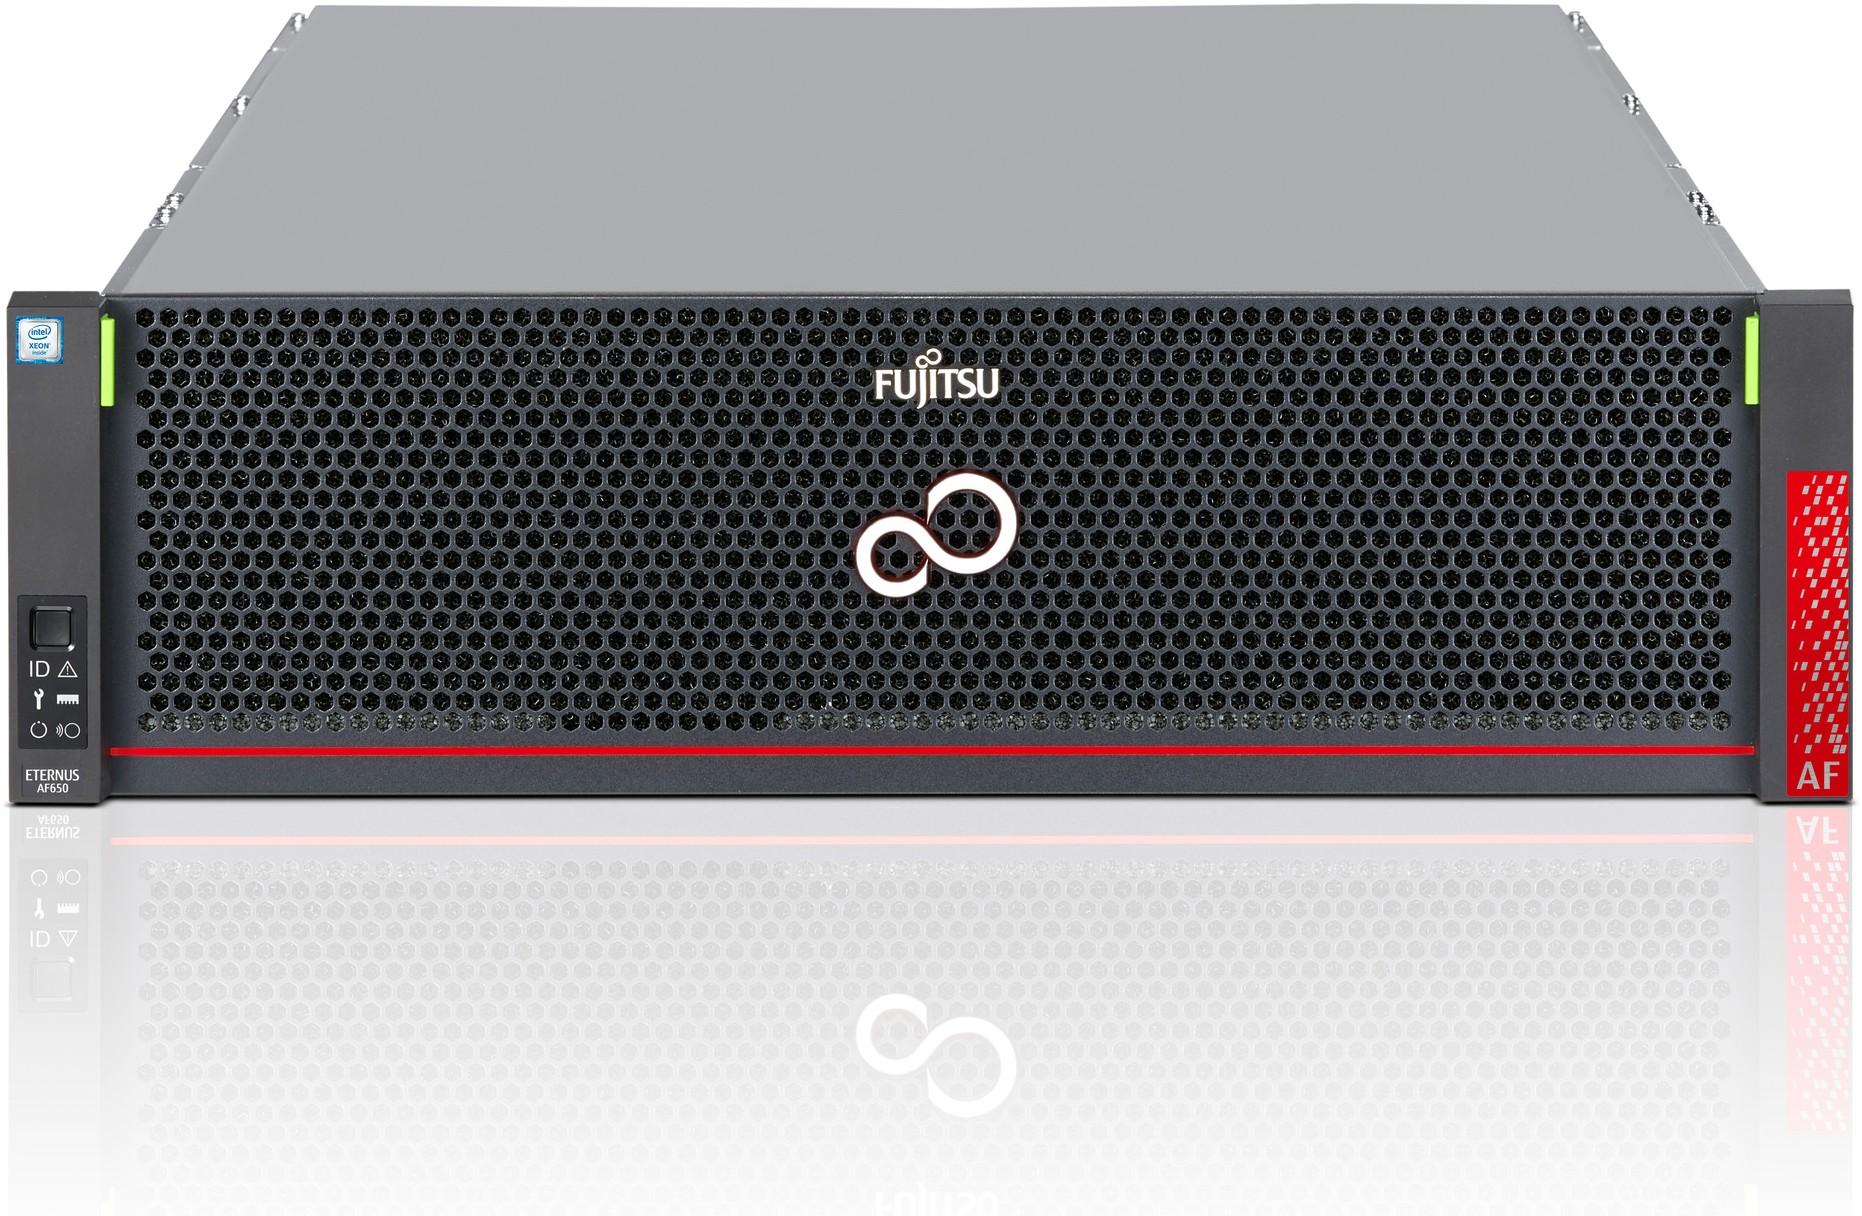 Fujitsu ETERNUS AF650 S2 Front